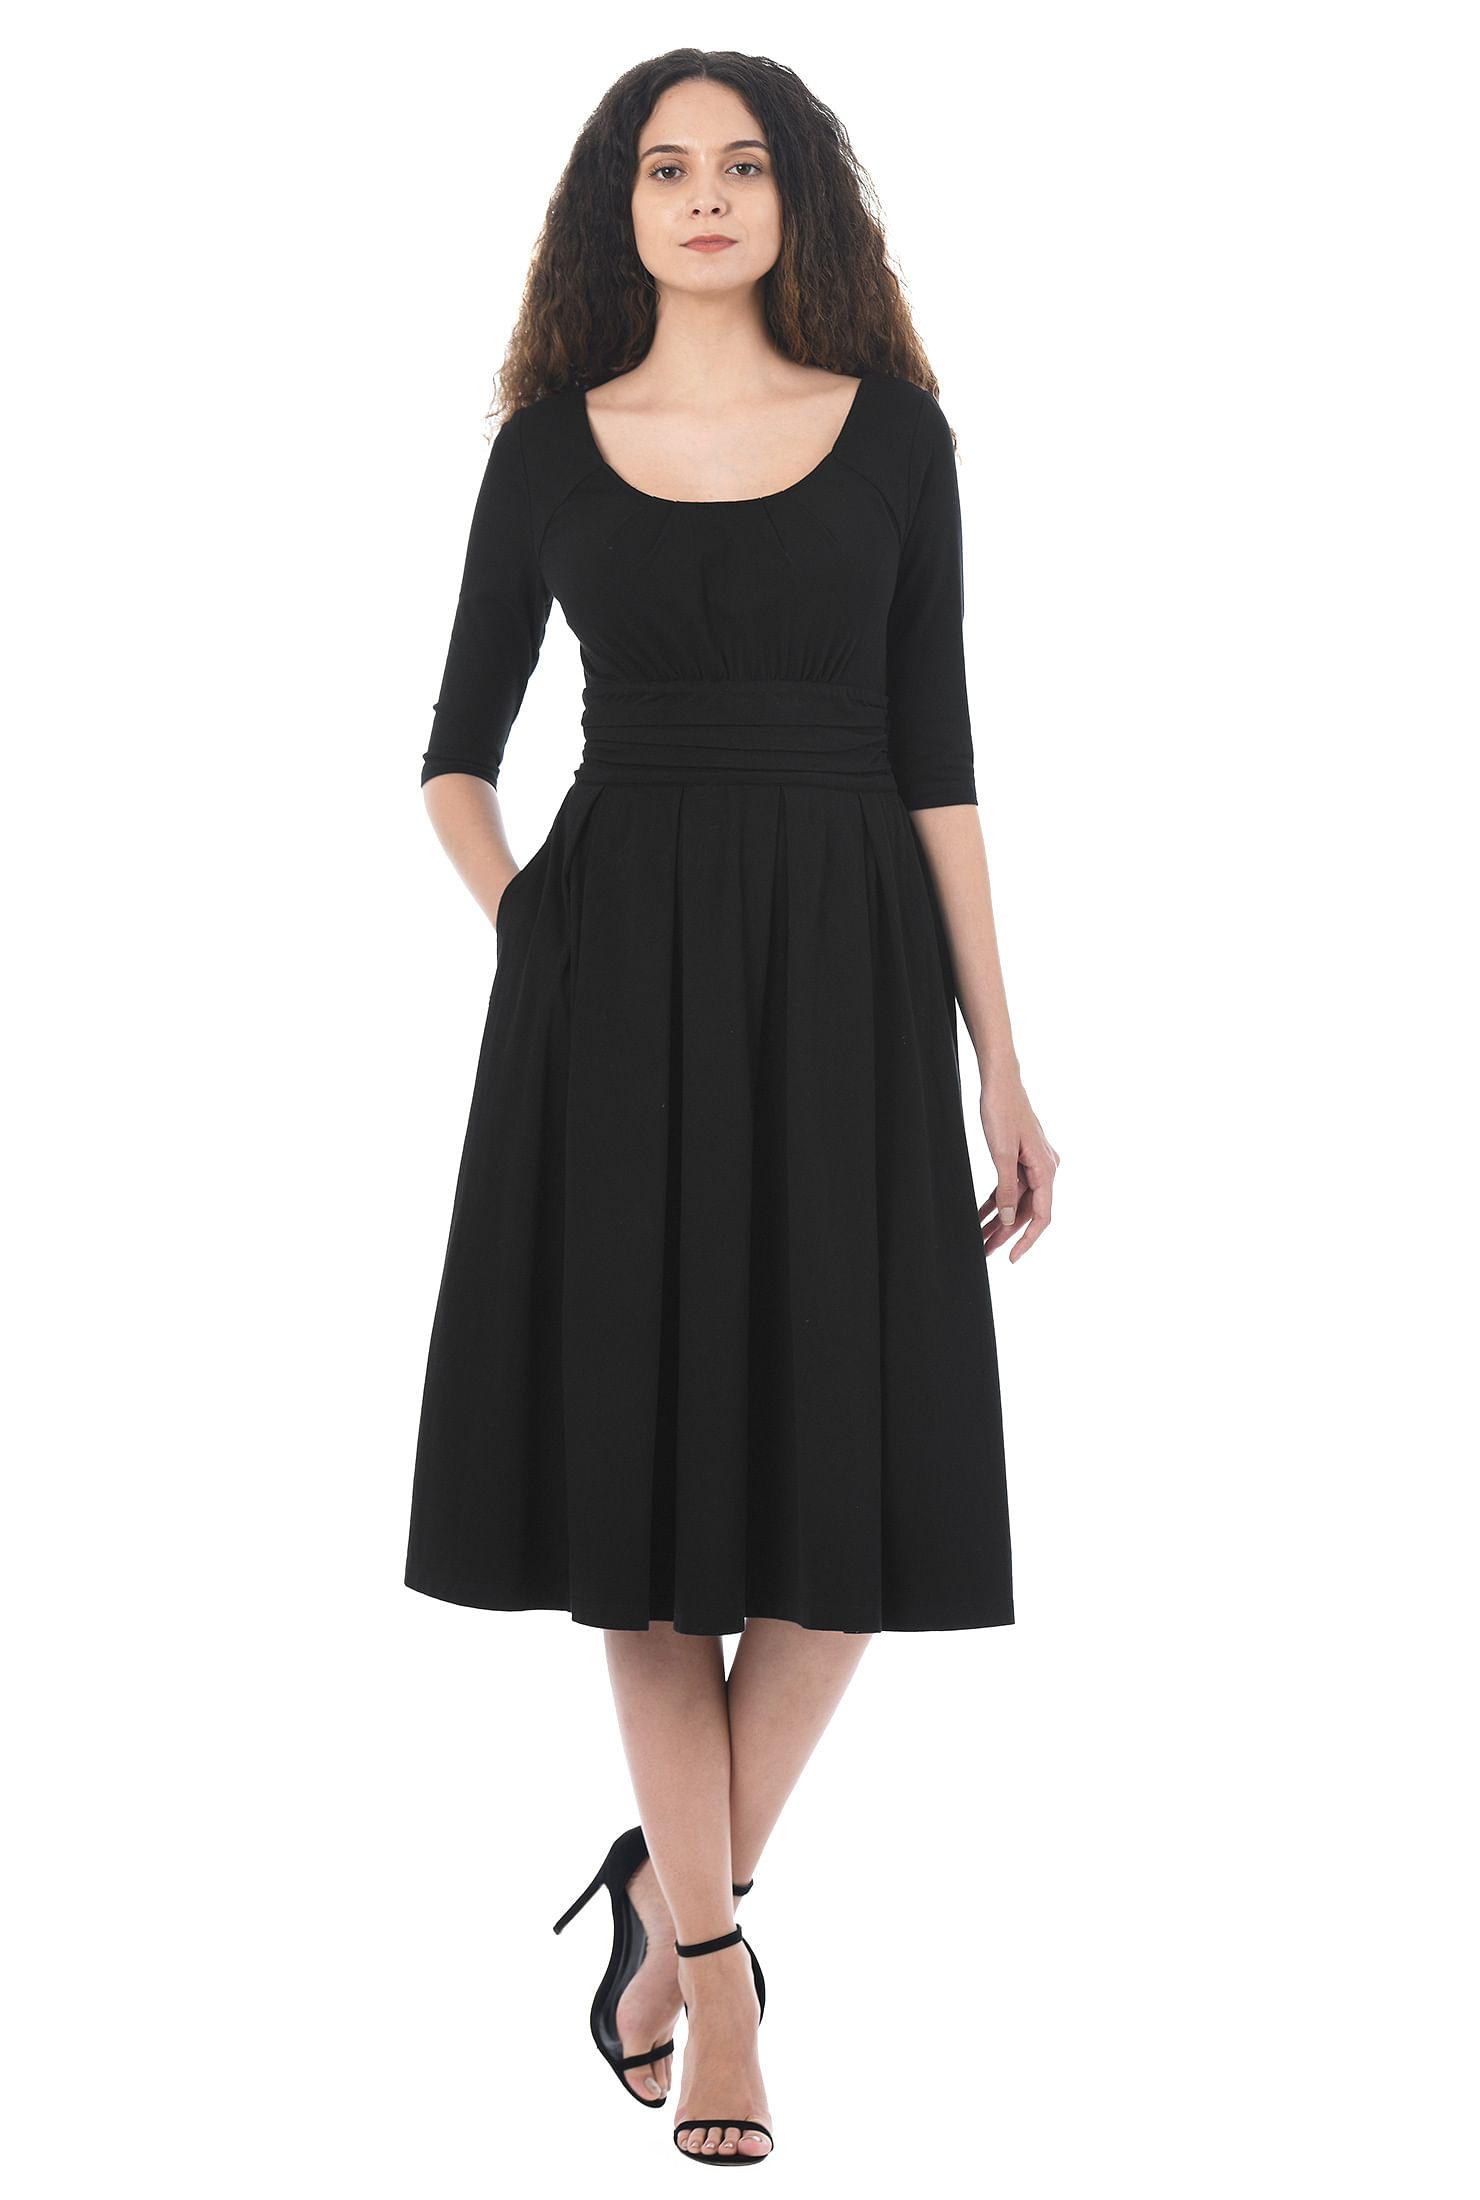 hot sales 08f0e c63cd Chelsea knit dress